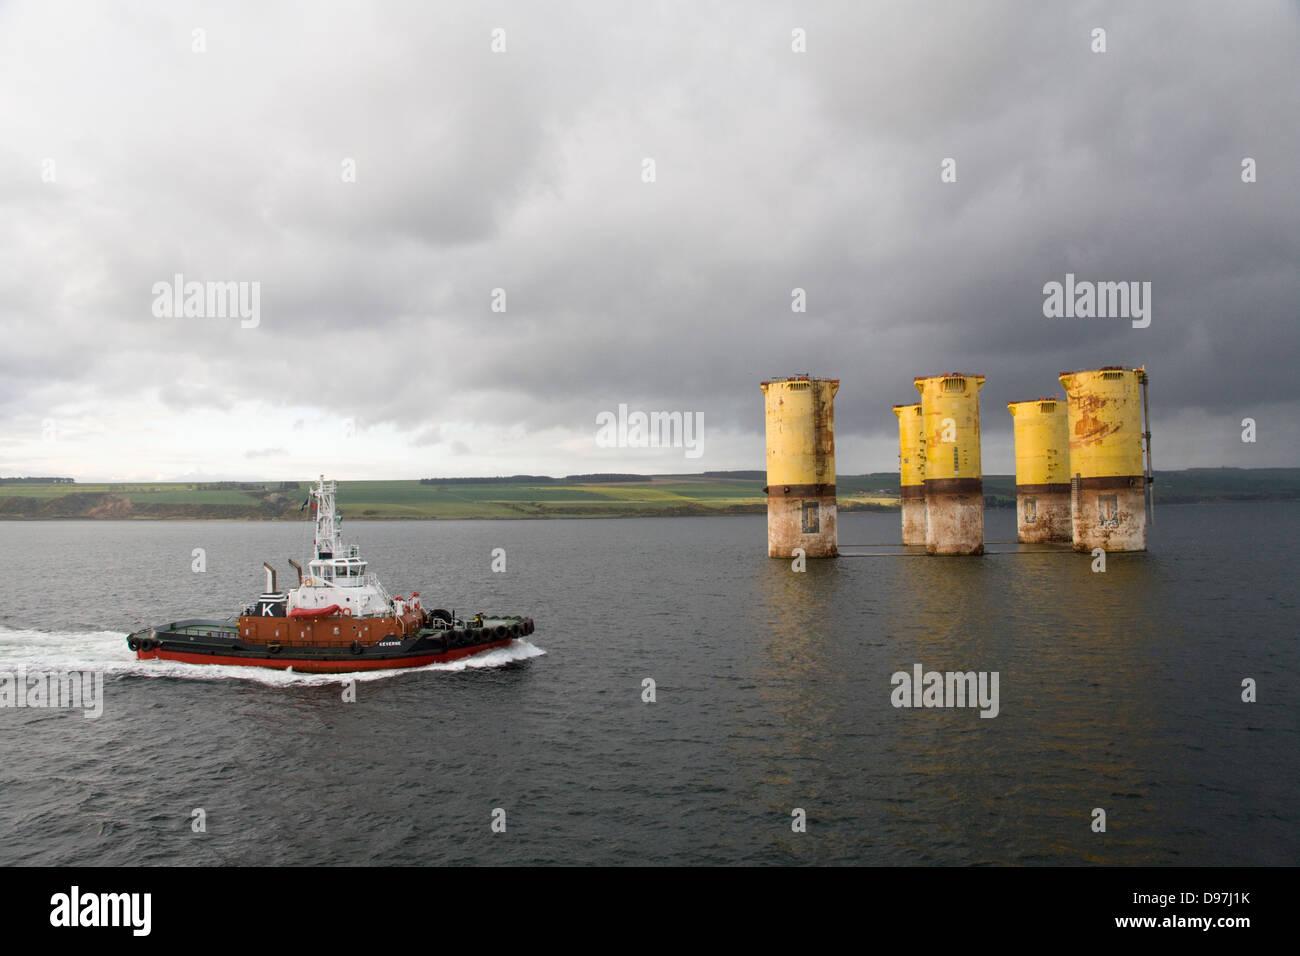 Tugboat Vessel Ship Invergordon Cromarty Firth Stock Photo